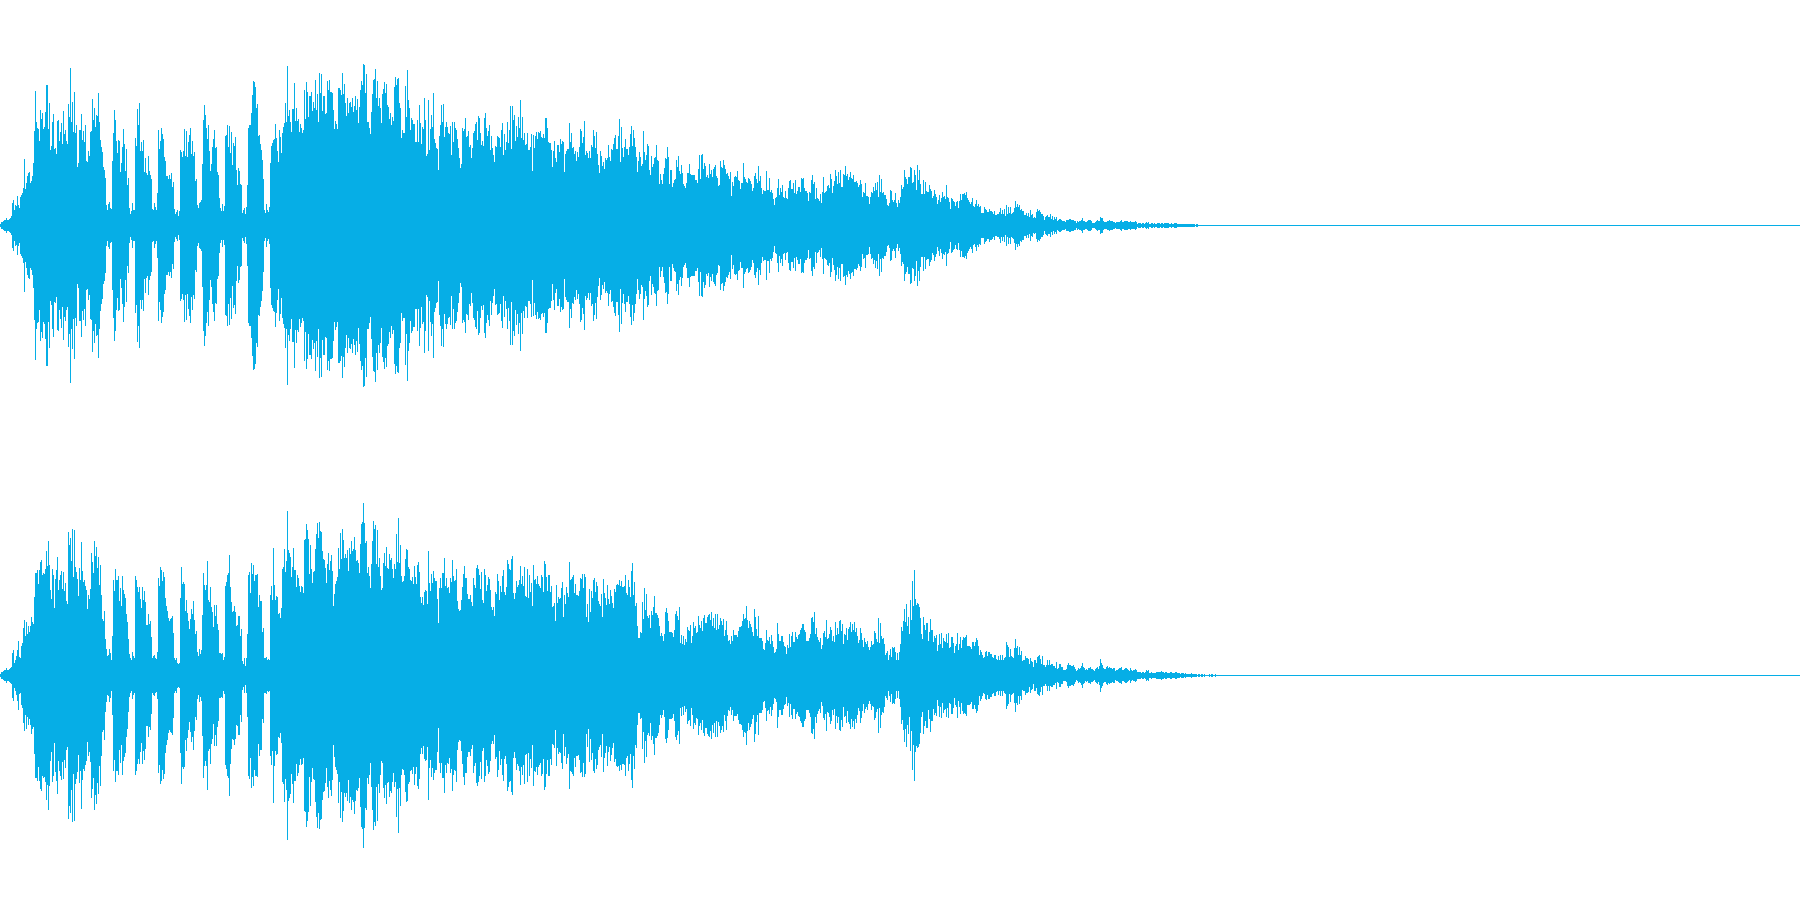 SFマシンが手前を横切って抜けていく音の再生済みの波形